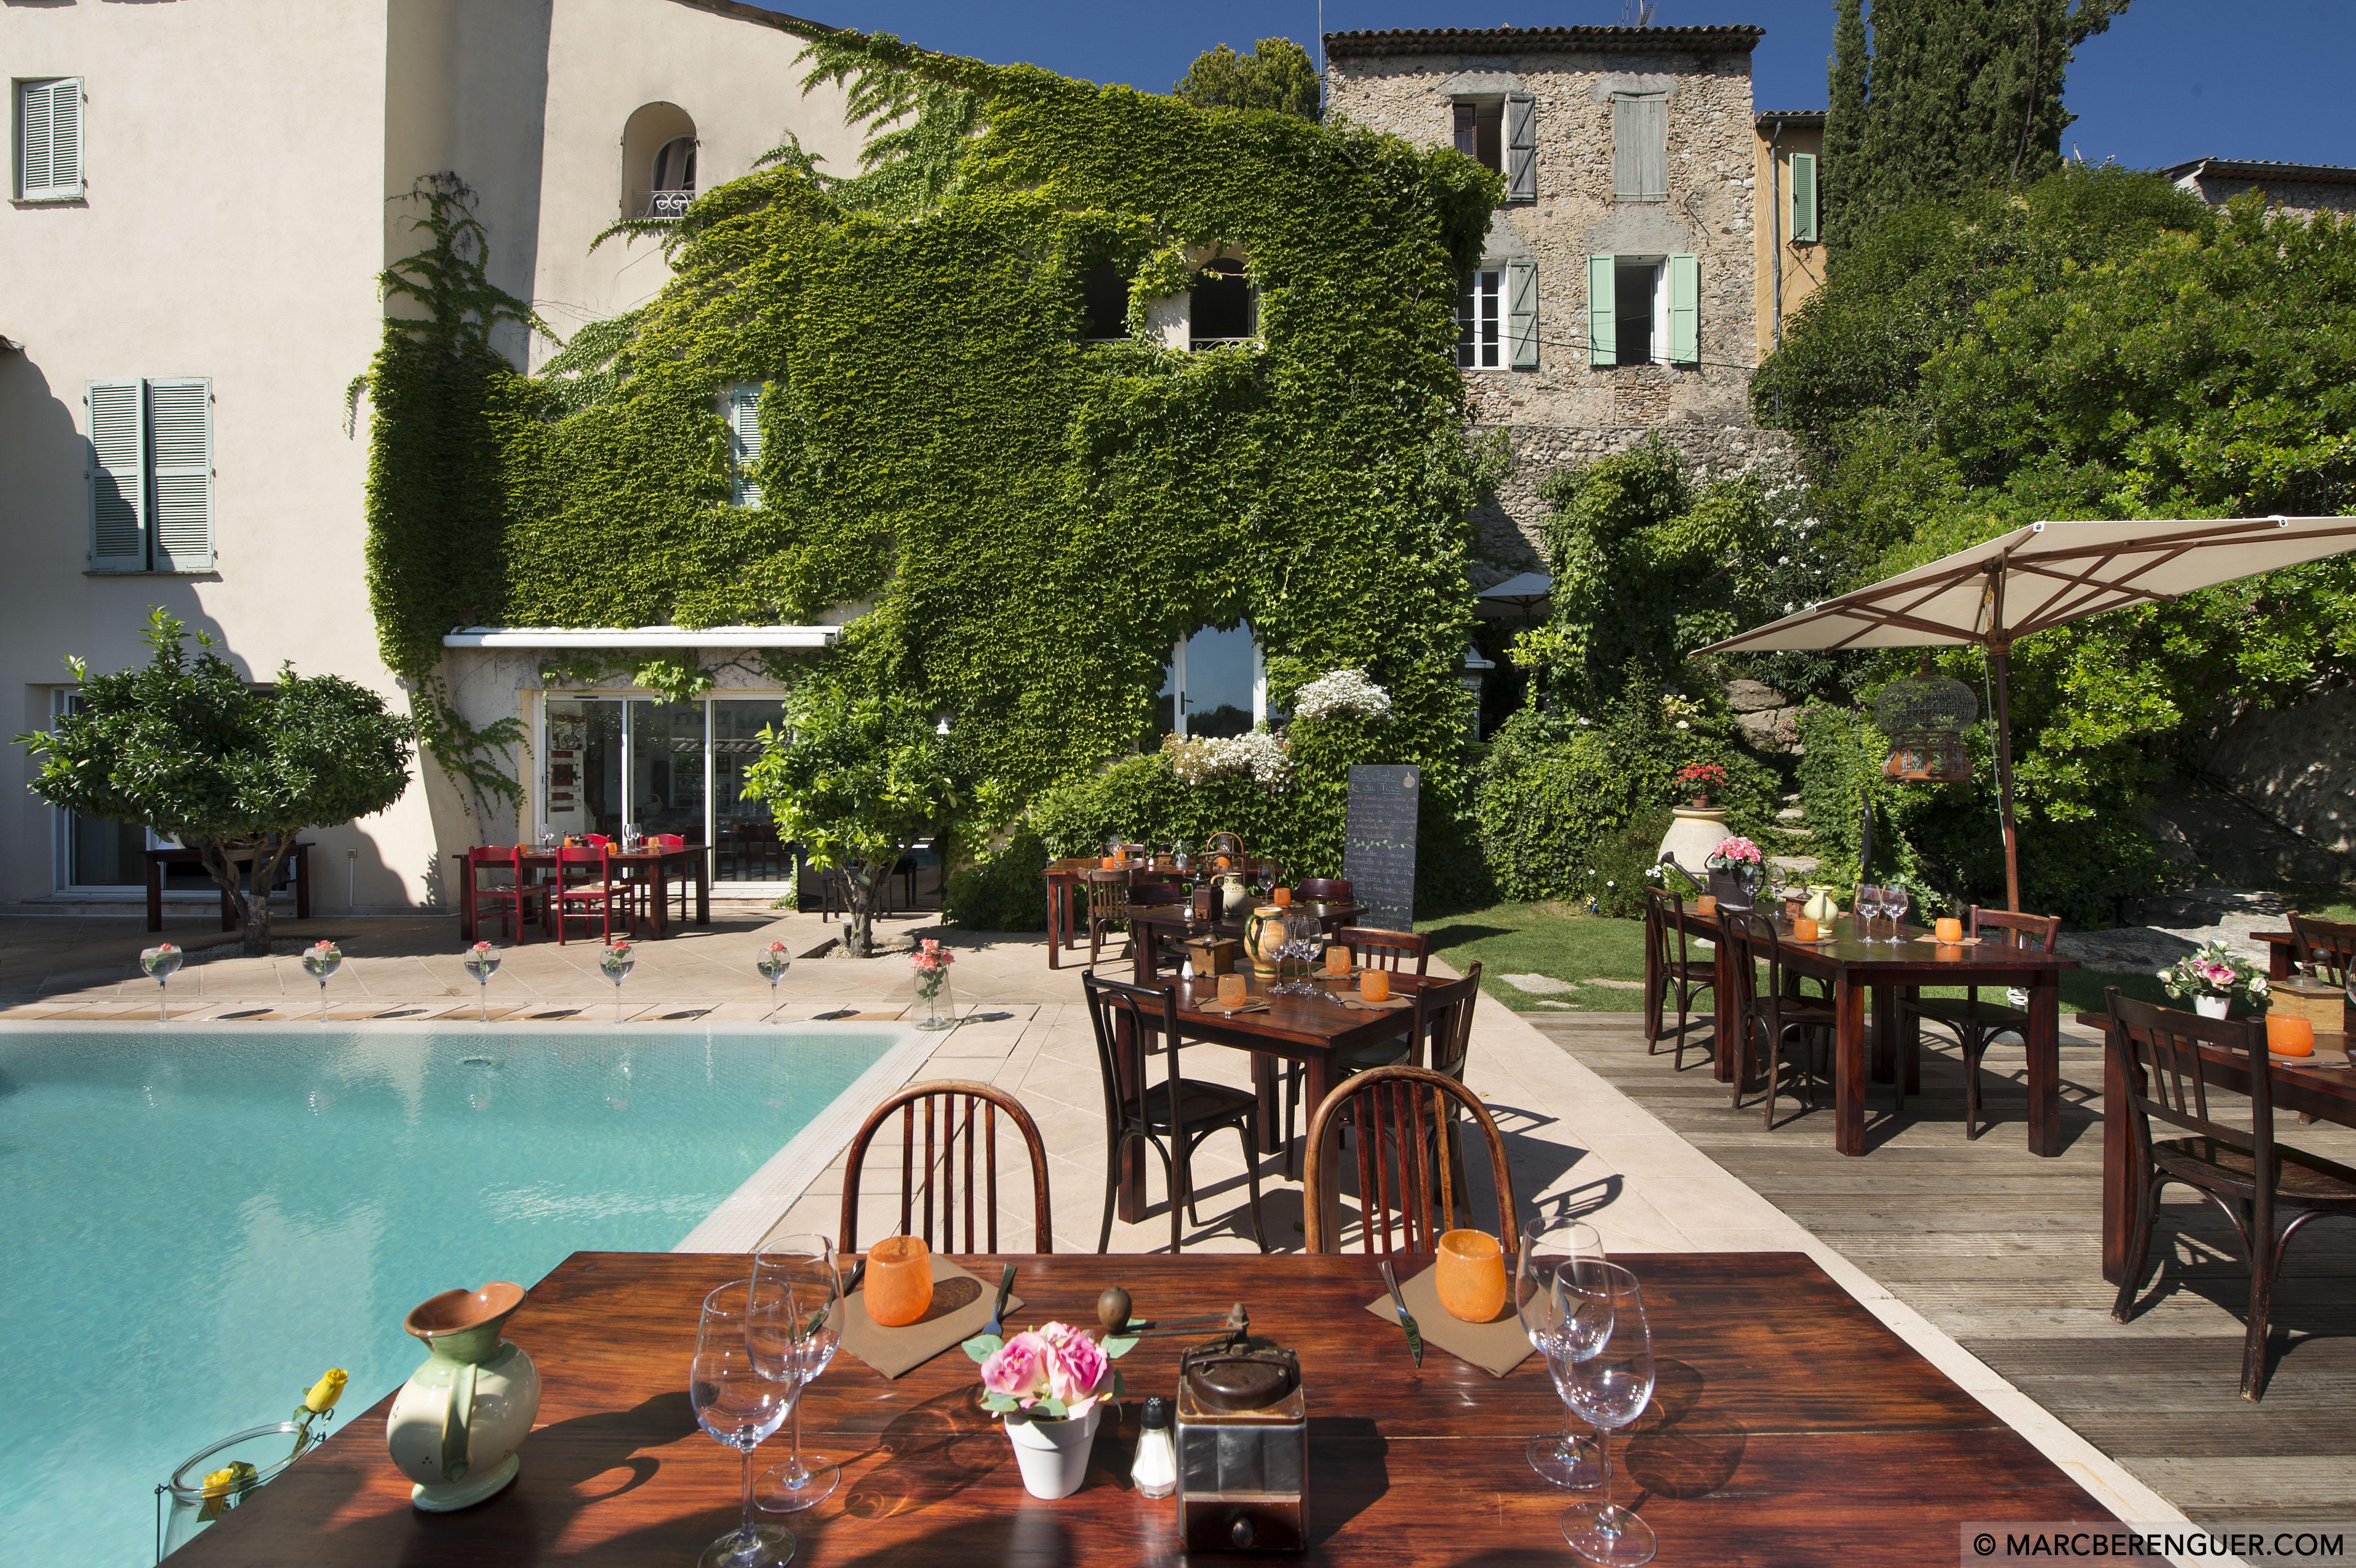 Le Jardin du Mas Biot Alpes Maritimes Provence Alpes C´te d